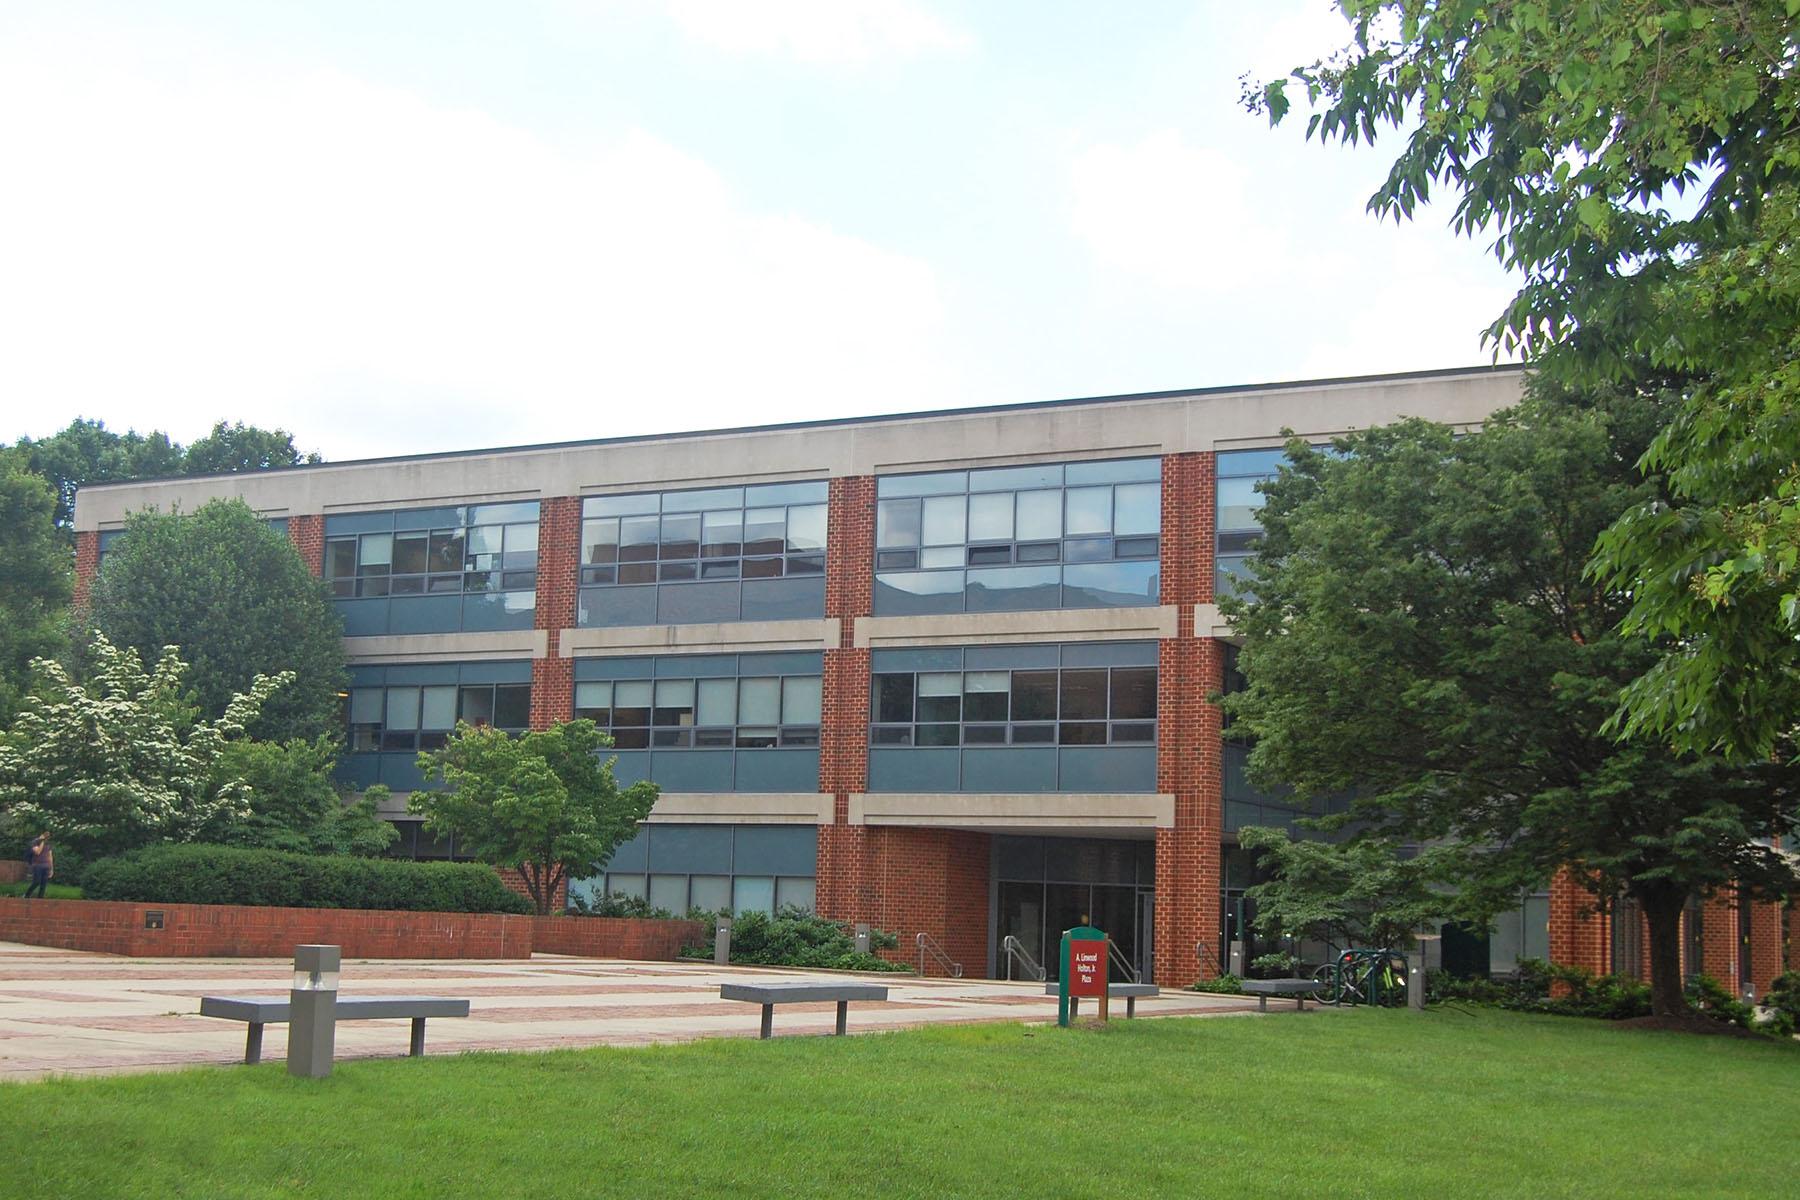 George Mason University - Mason Hall from Commonwealth Blinds & Shades